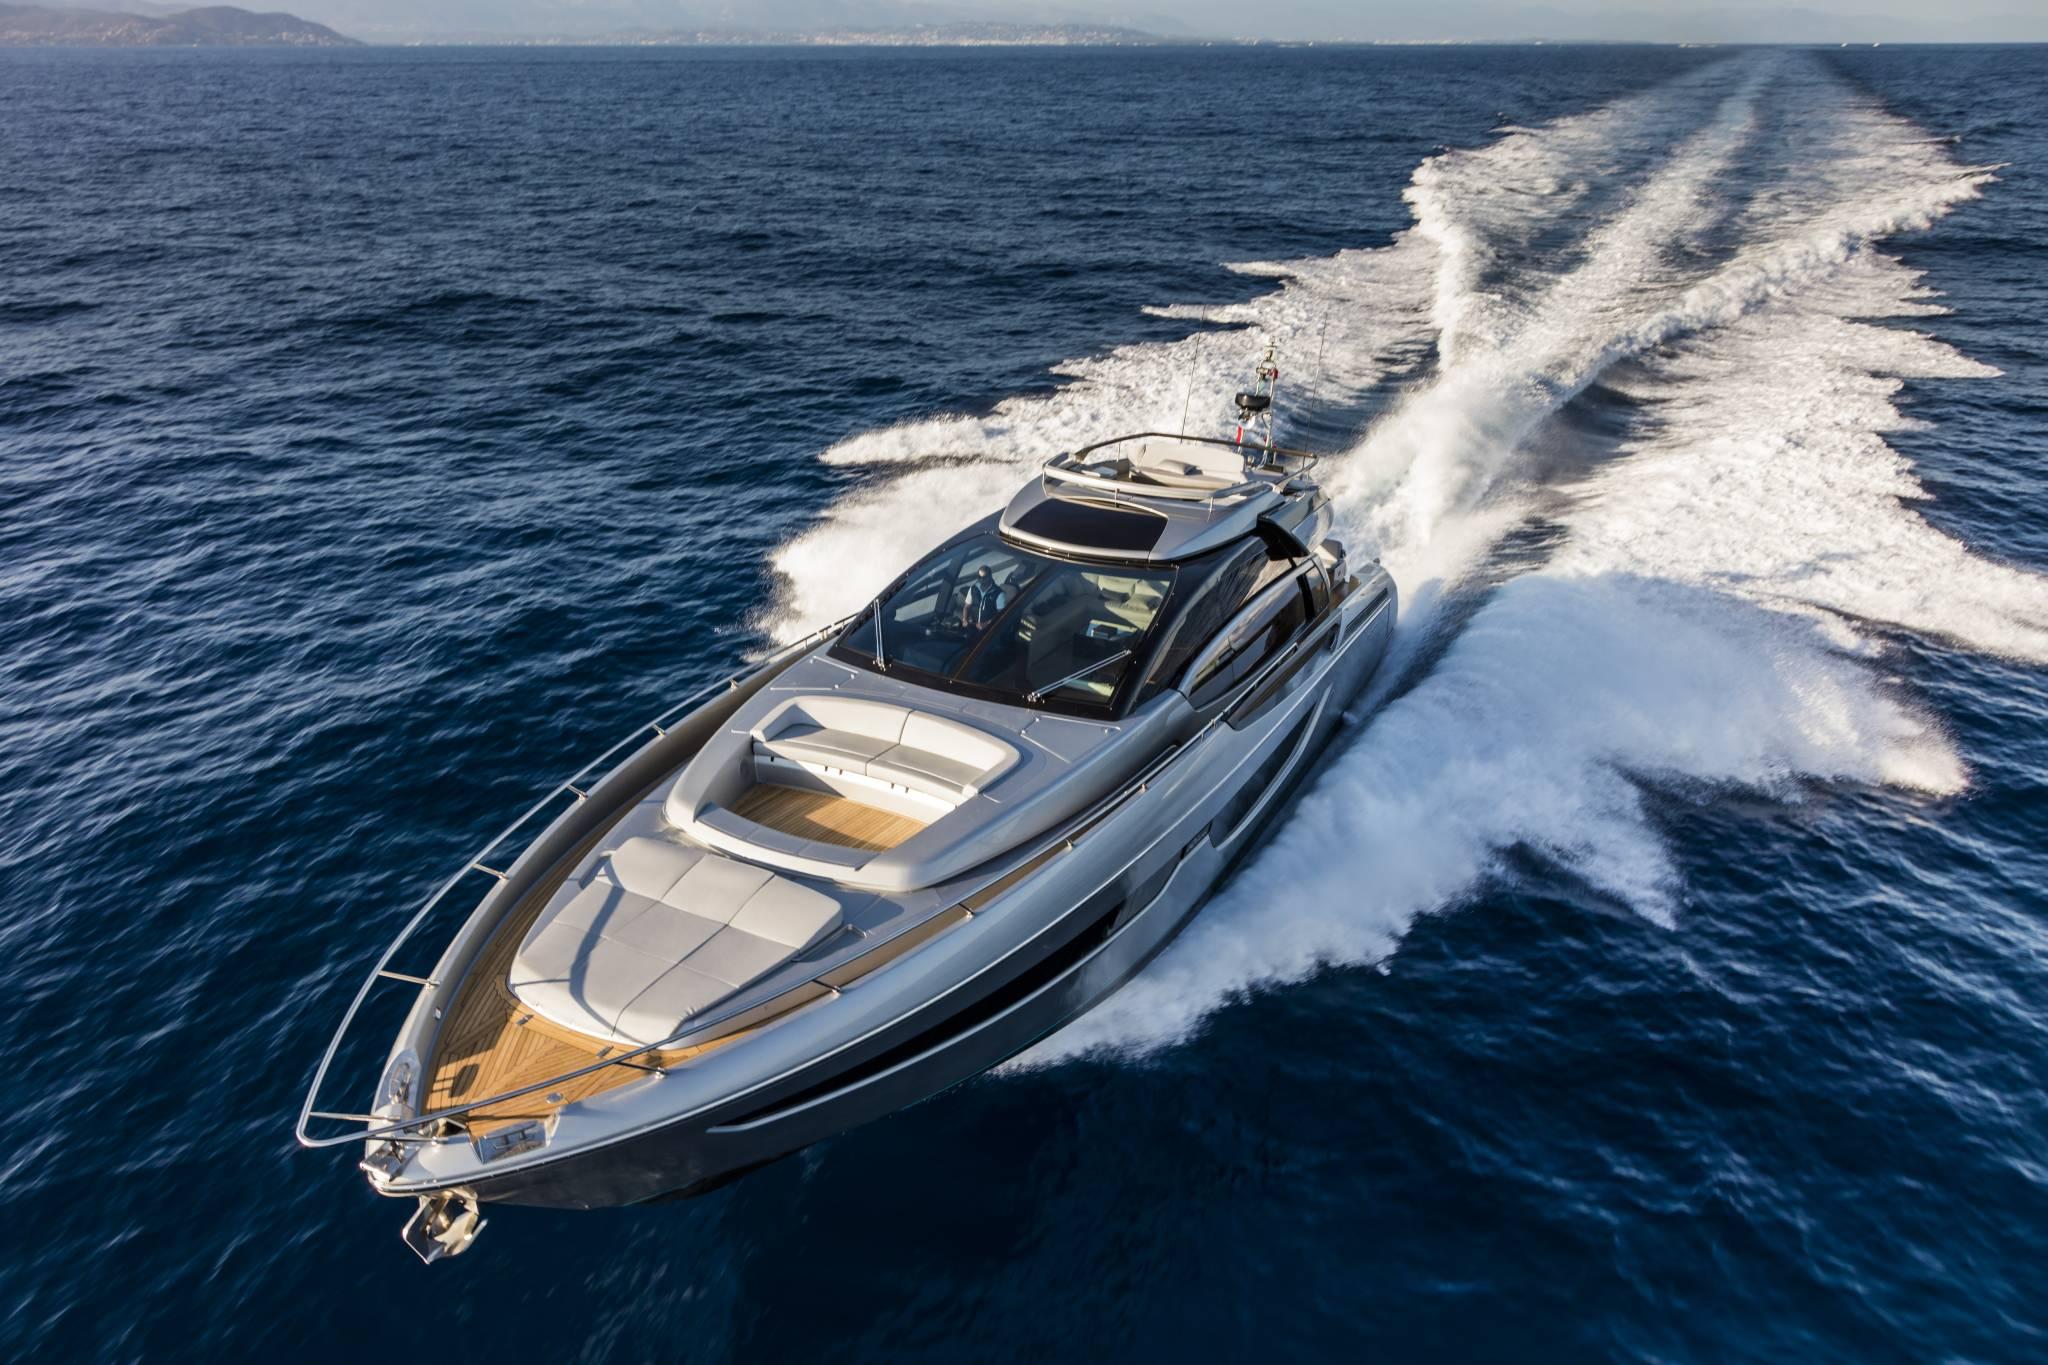 Riva 76 Perseo Ita Yachts Canada Ita Yachts Canada